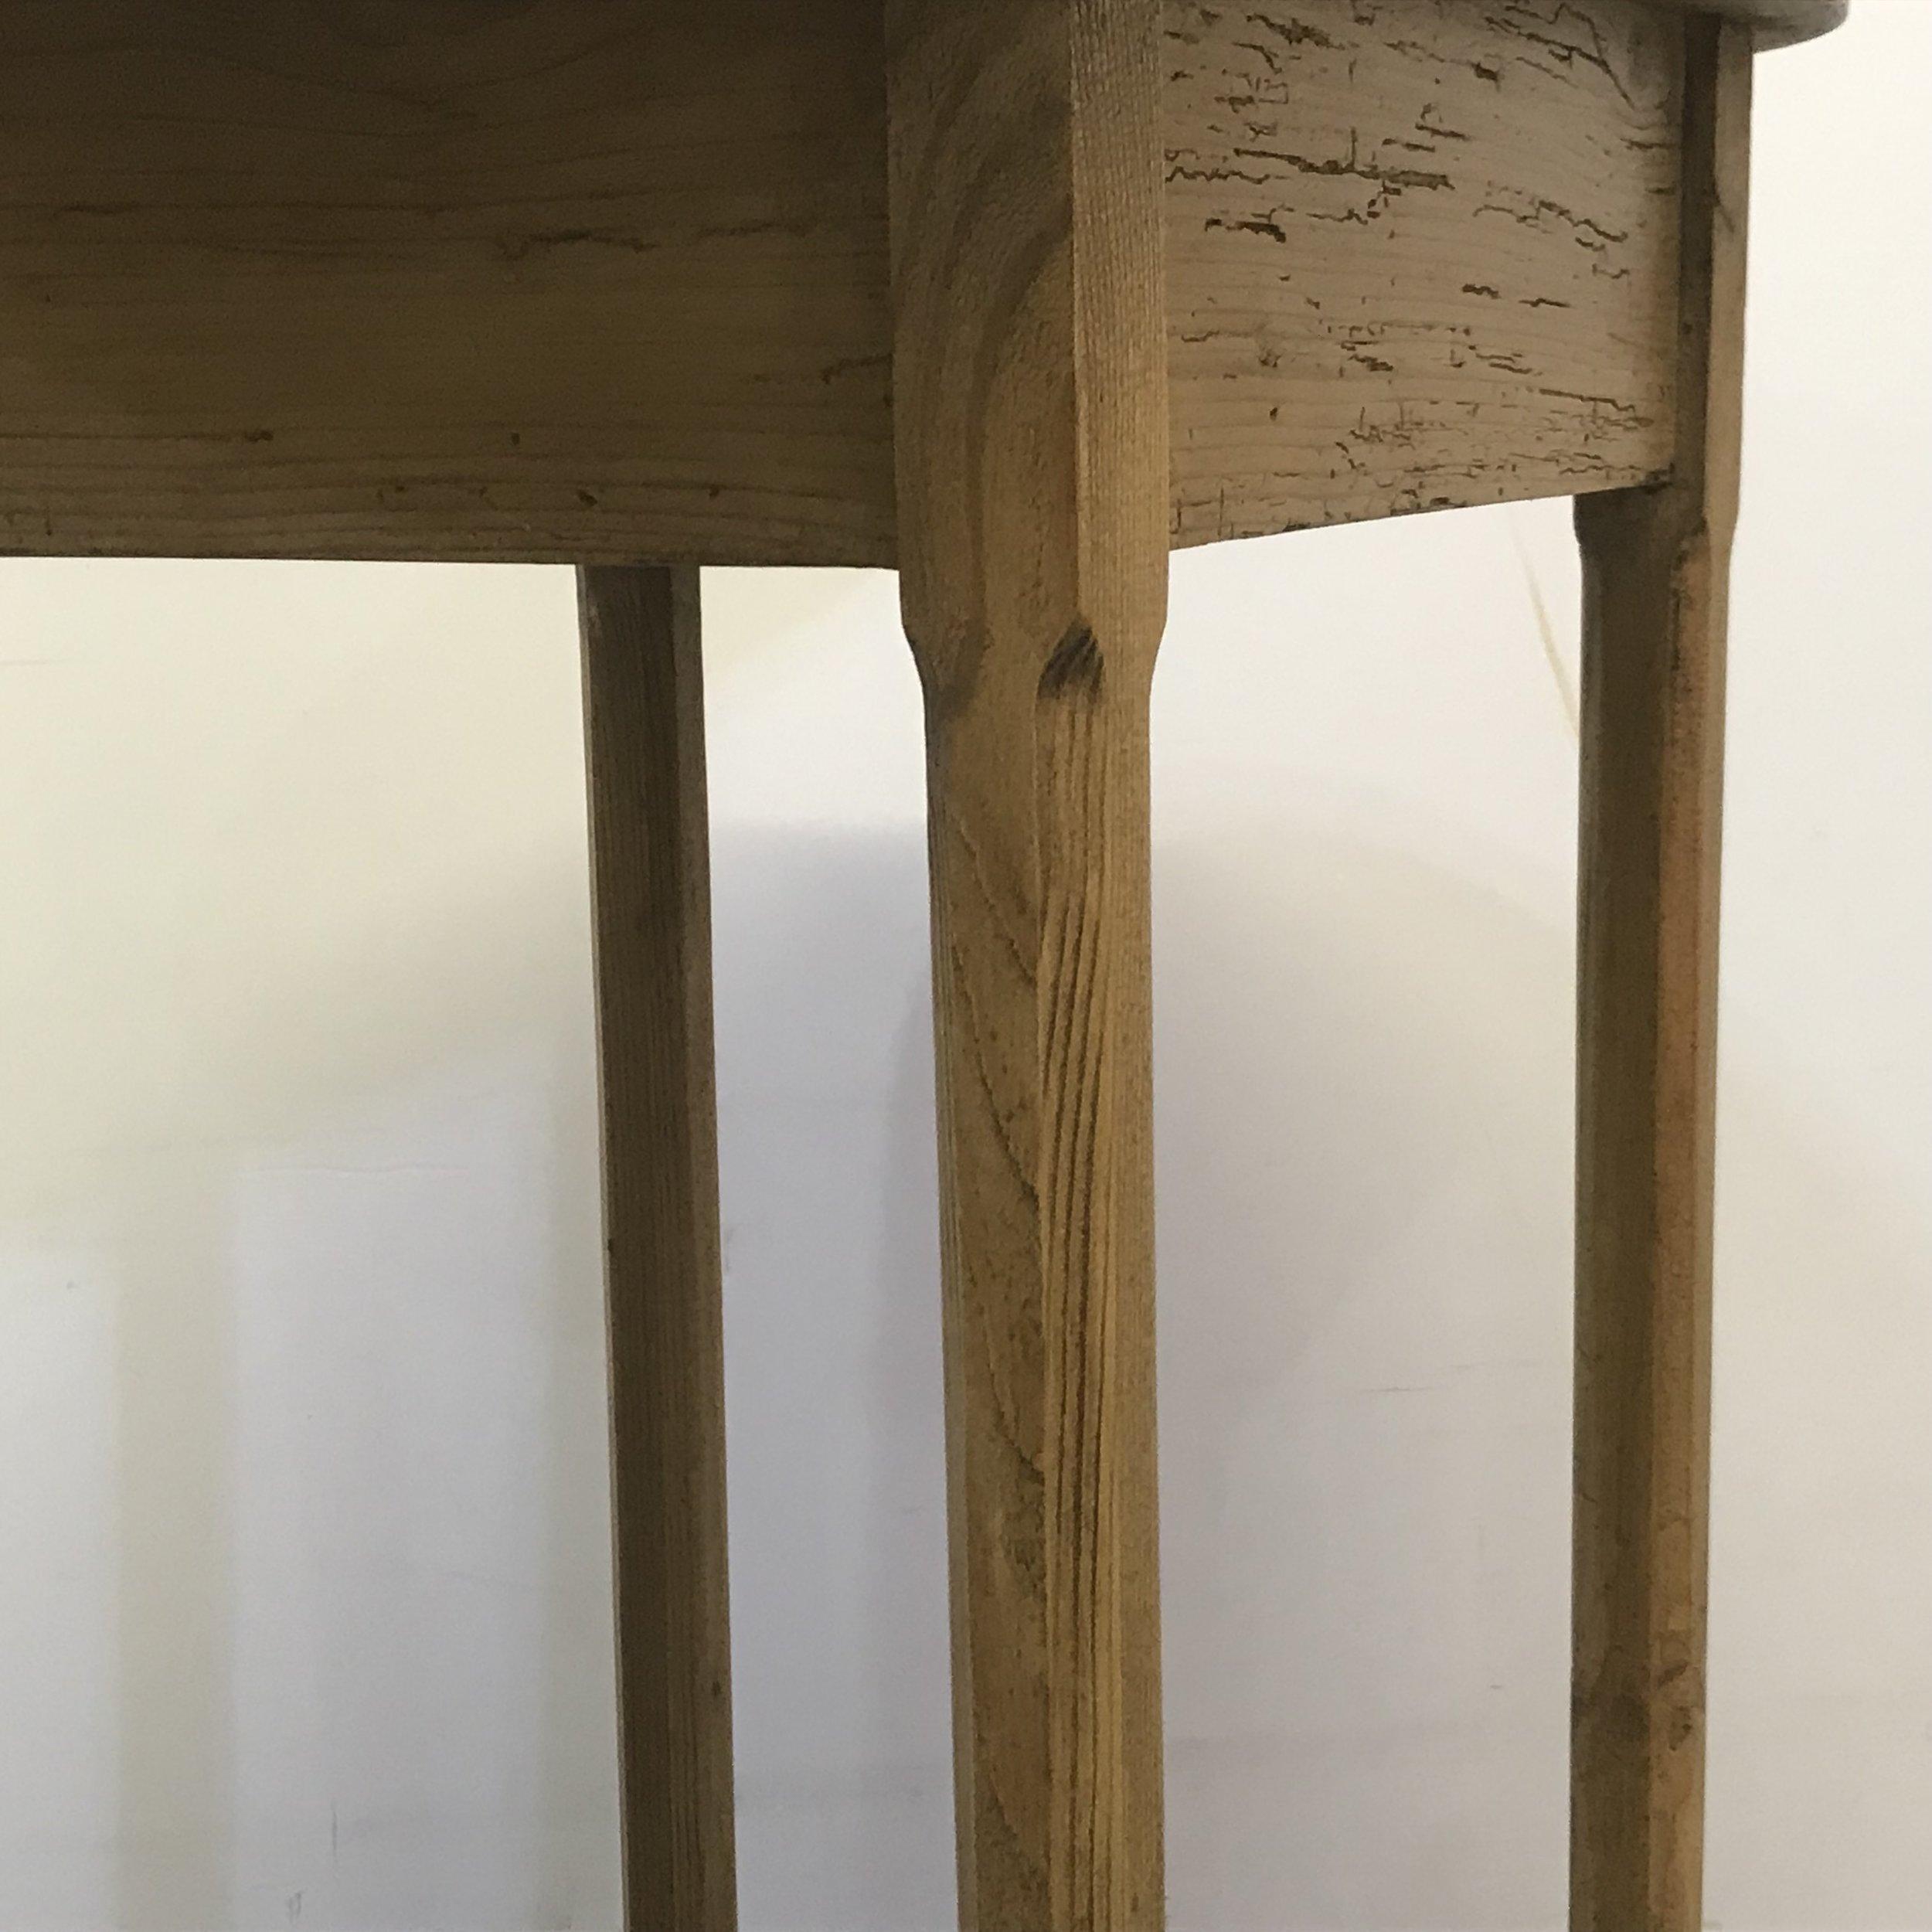 Octagonal table legs